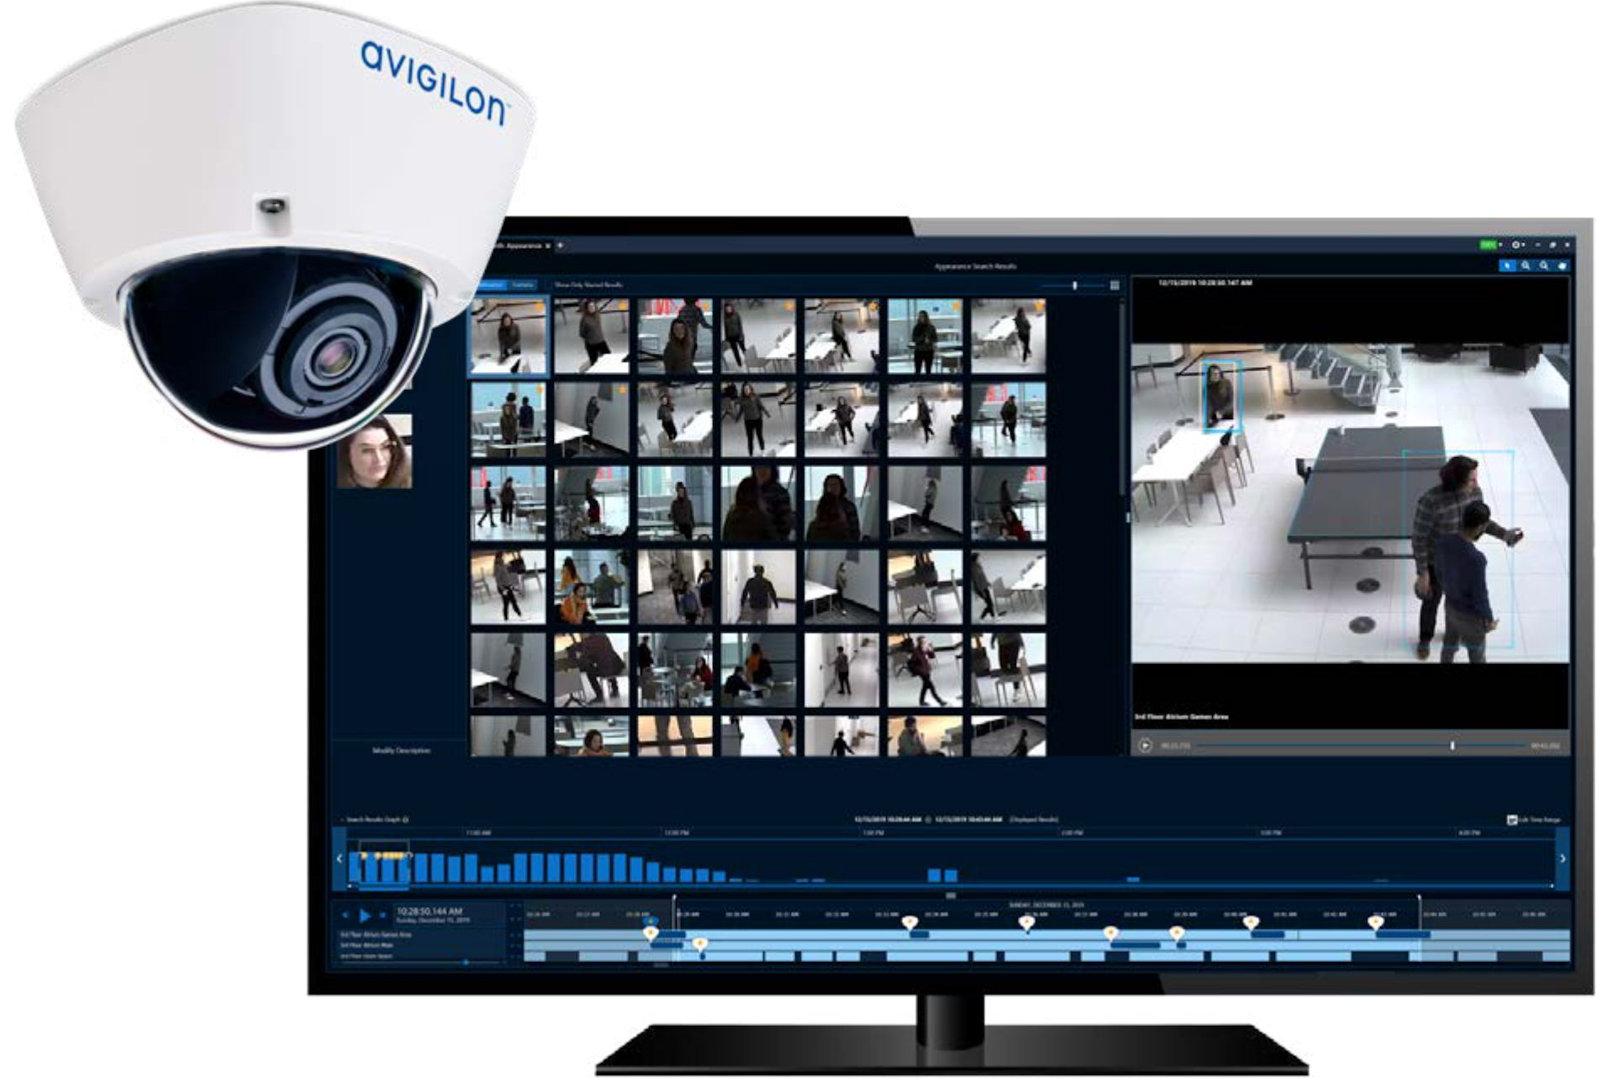 avigilon cctv analytics software